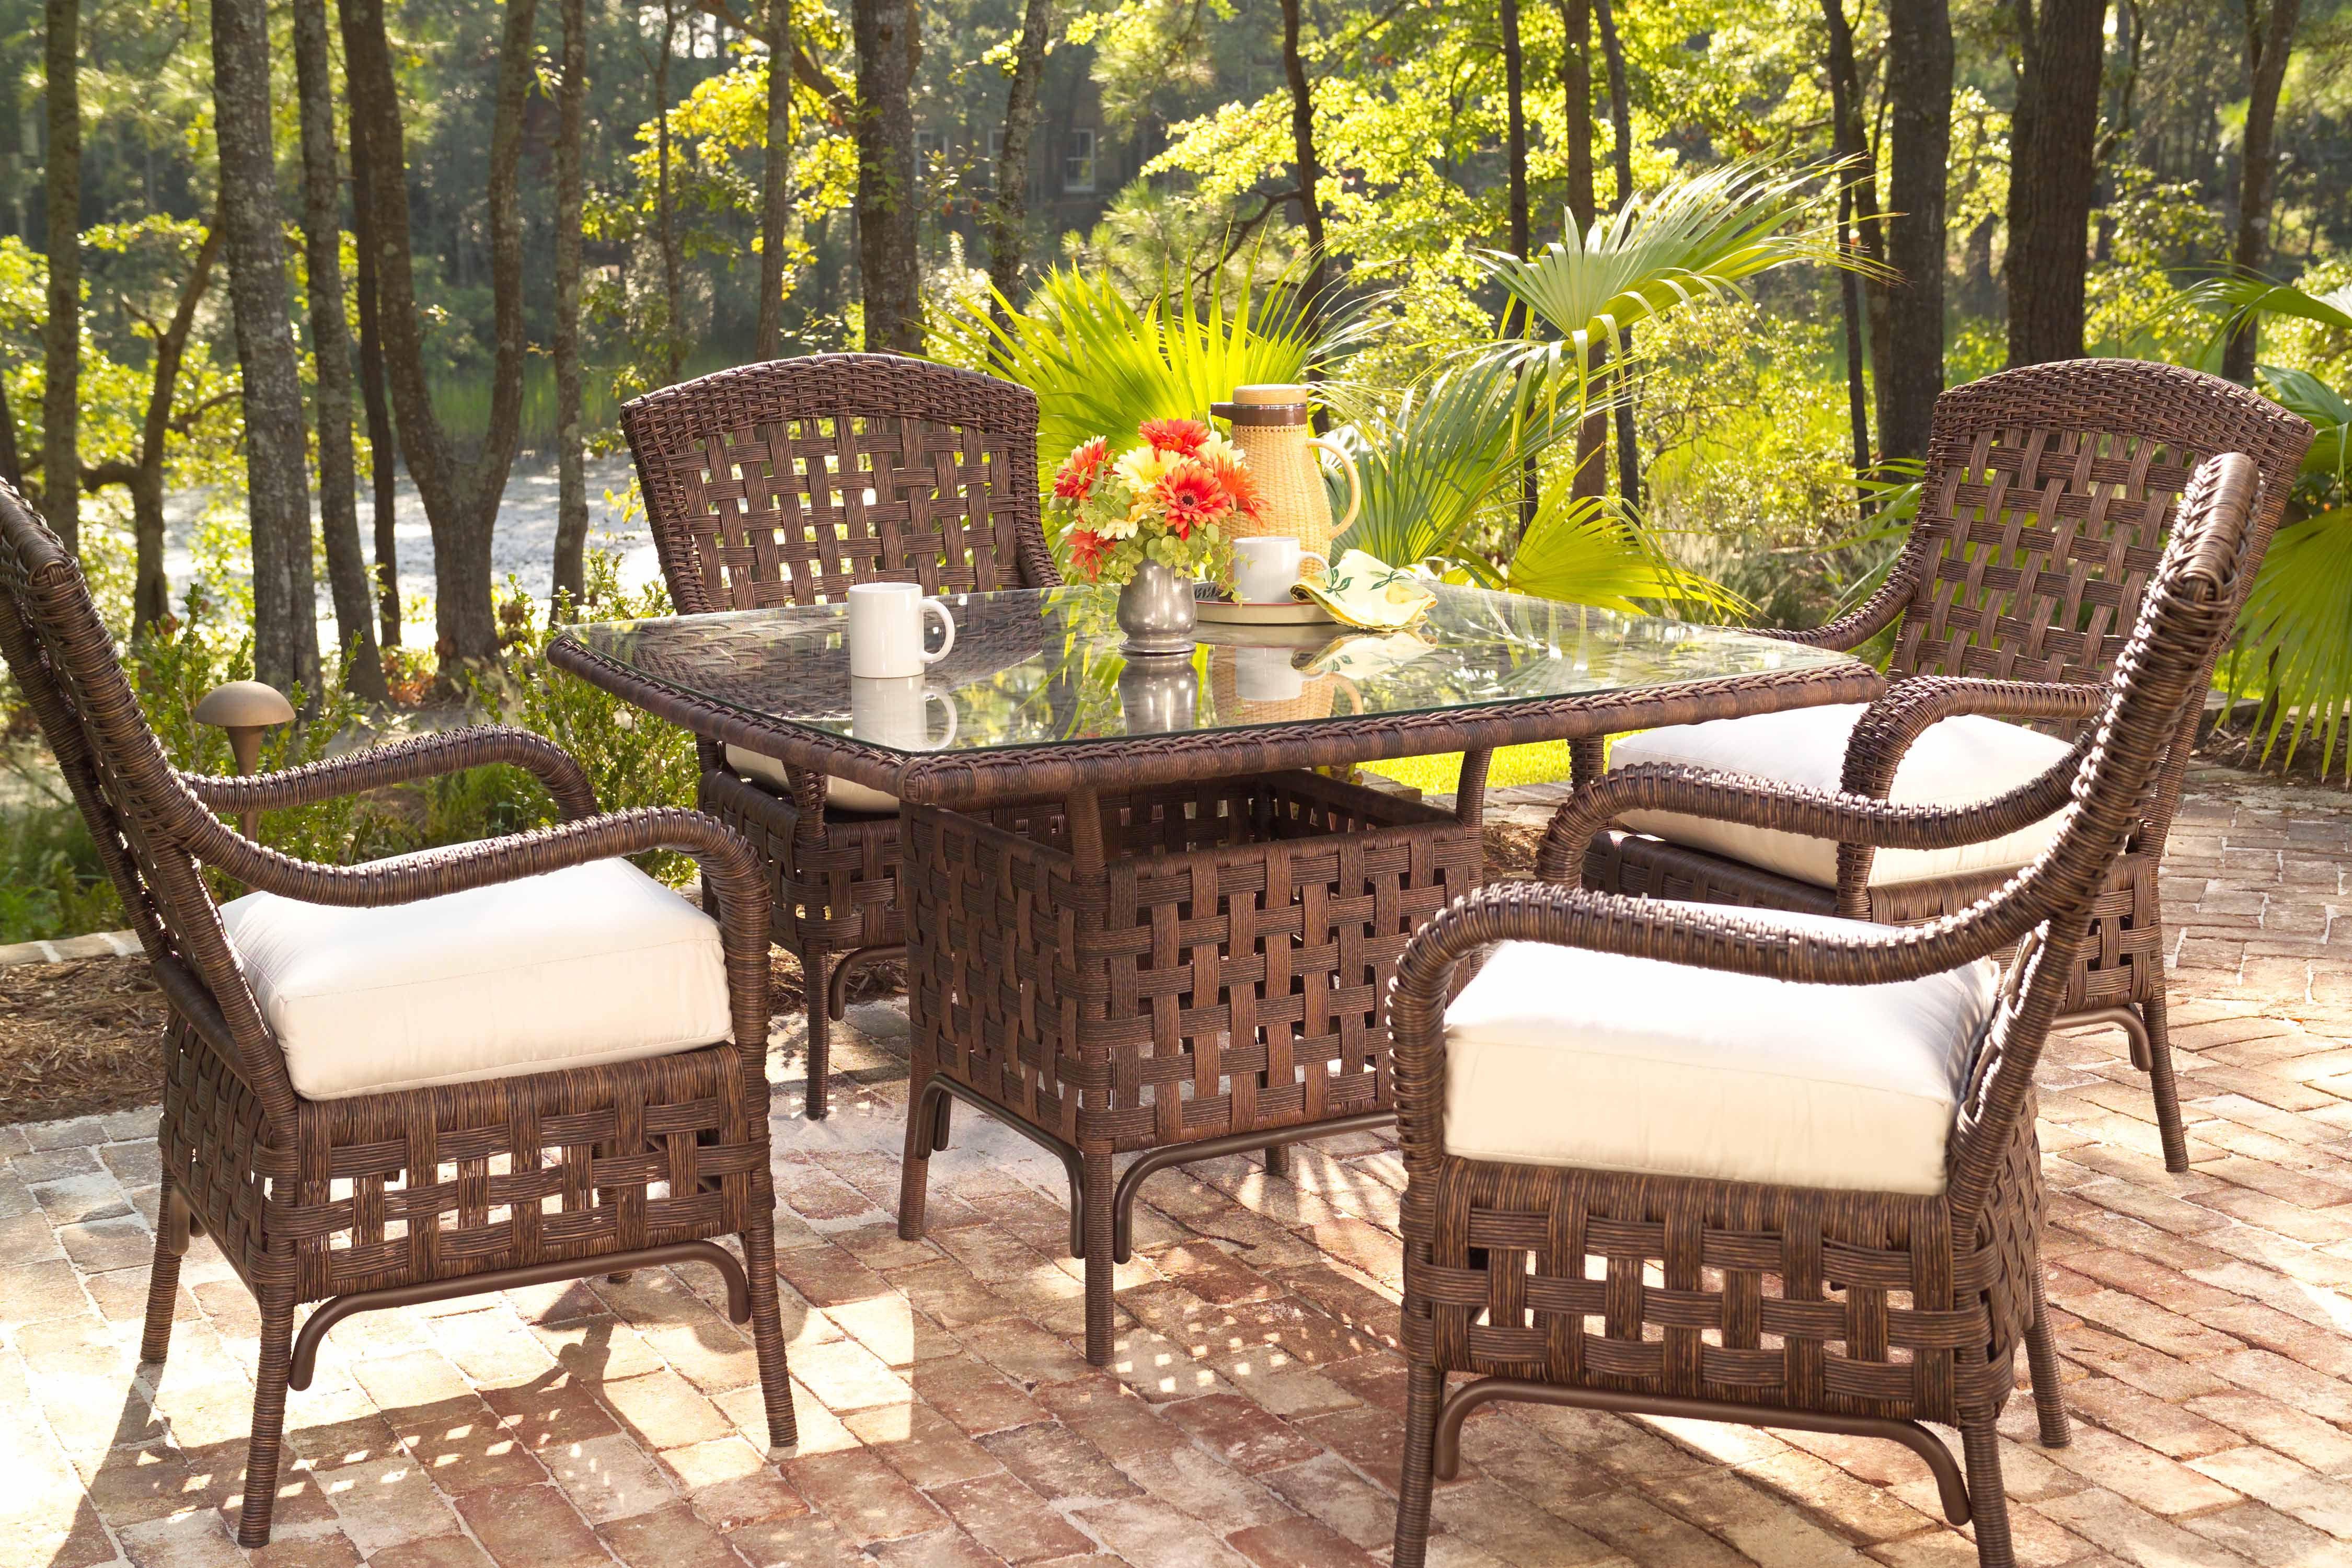 Wicker Patio Furniture: Energy Center Manhattan Pool 528 Pillsbury Drive  Manhattan, KS 66502